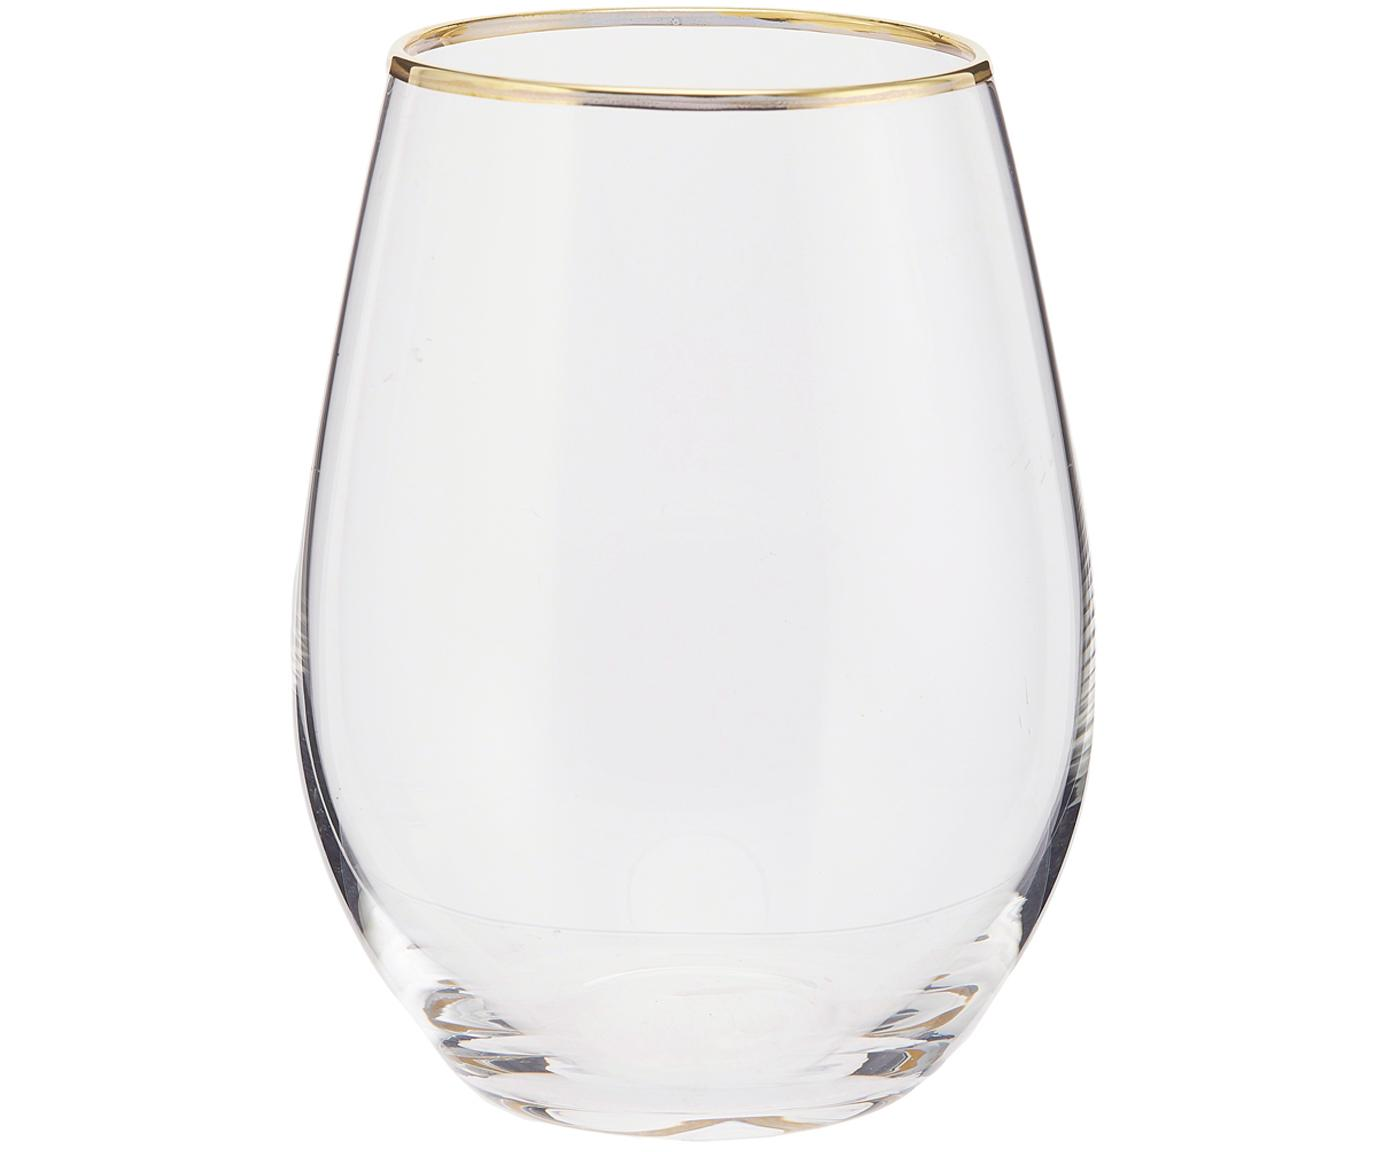 Waterglazen Chloe, 4 stuks, Glas, Transparant, goudkleurig, Ø 10 x H 15 cm